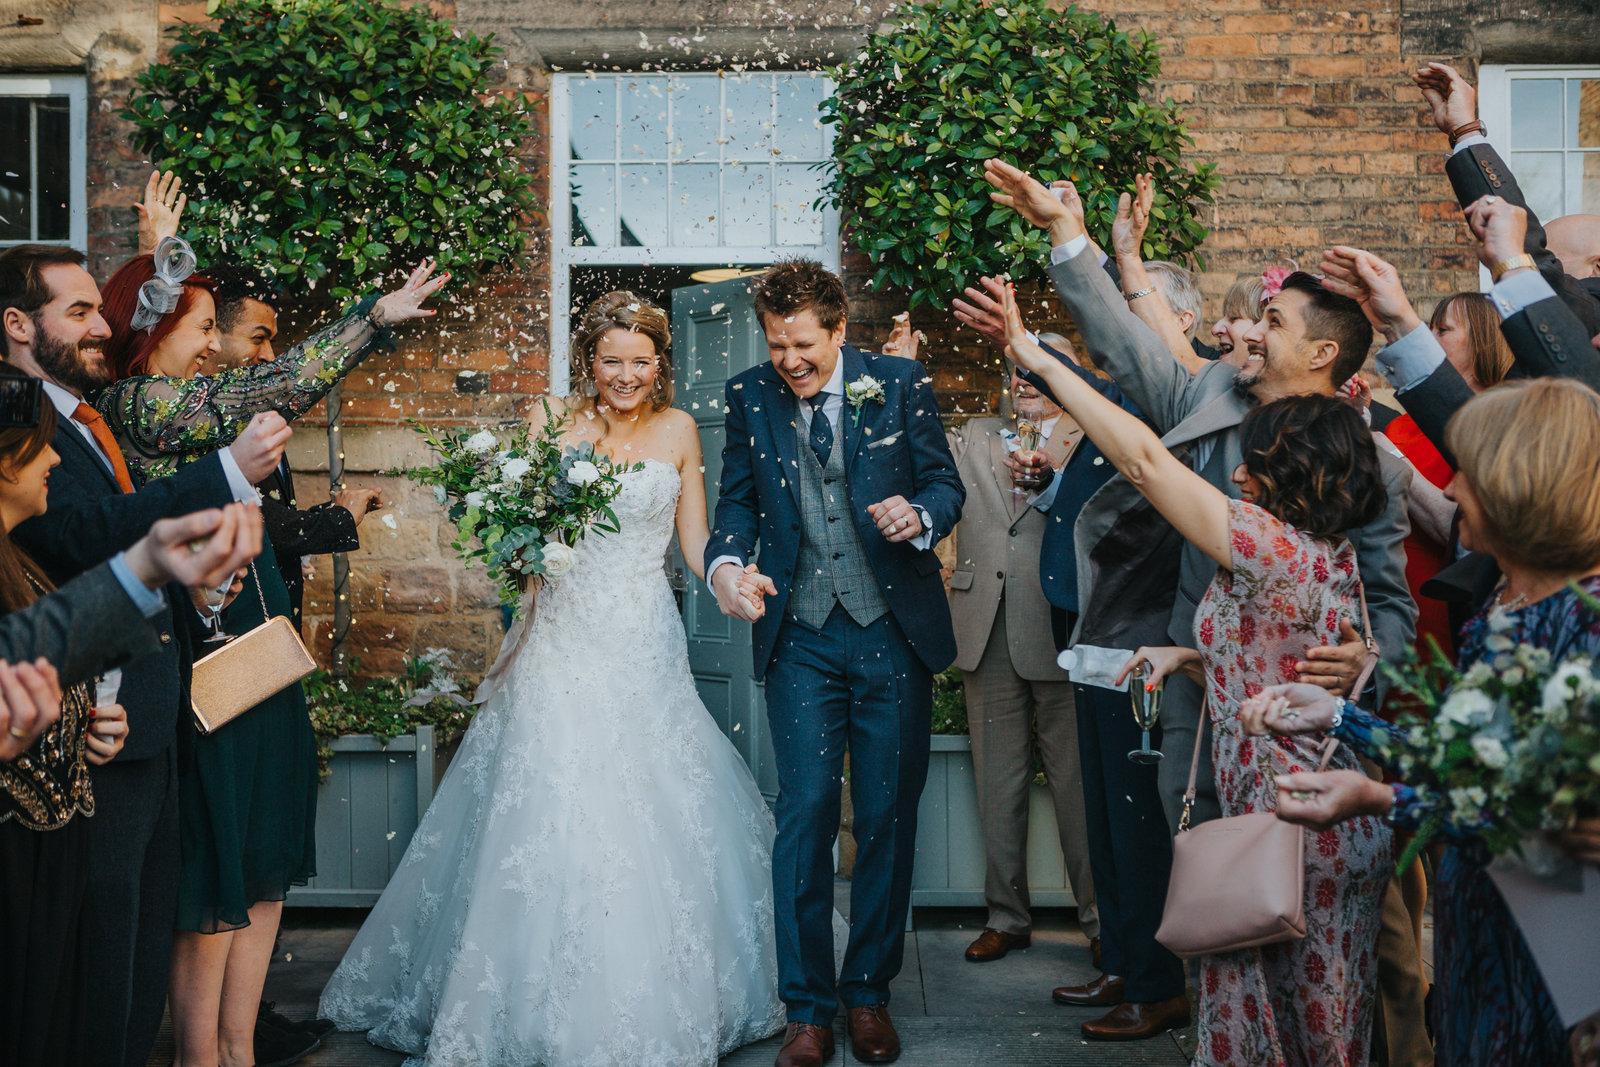 36-Chloe & Tom Wedding-555.jpg